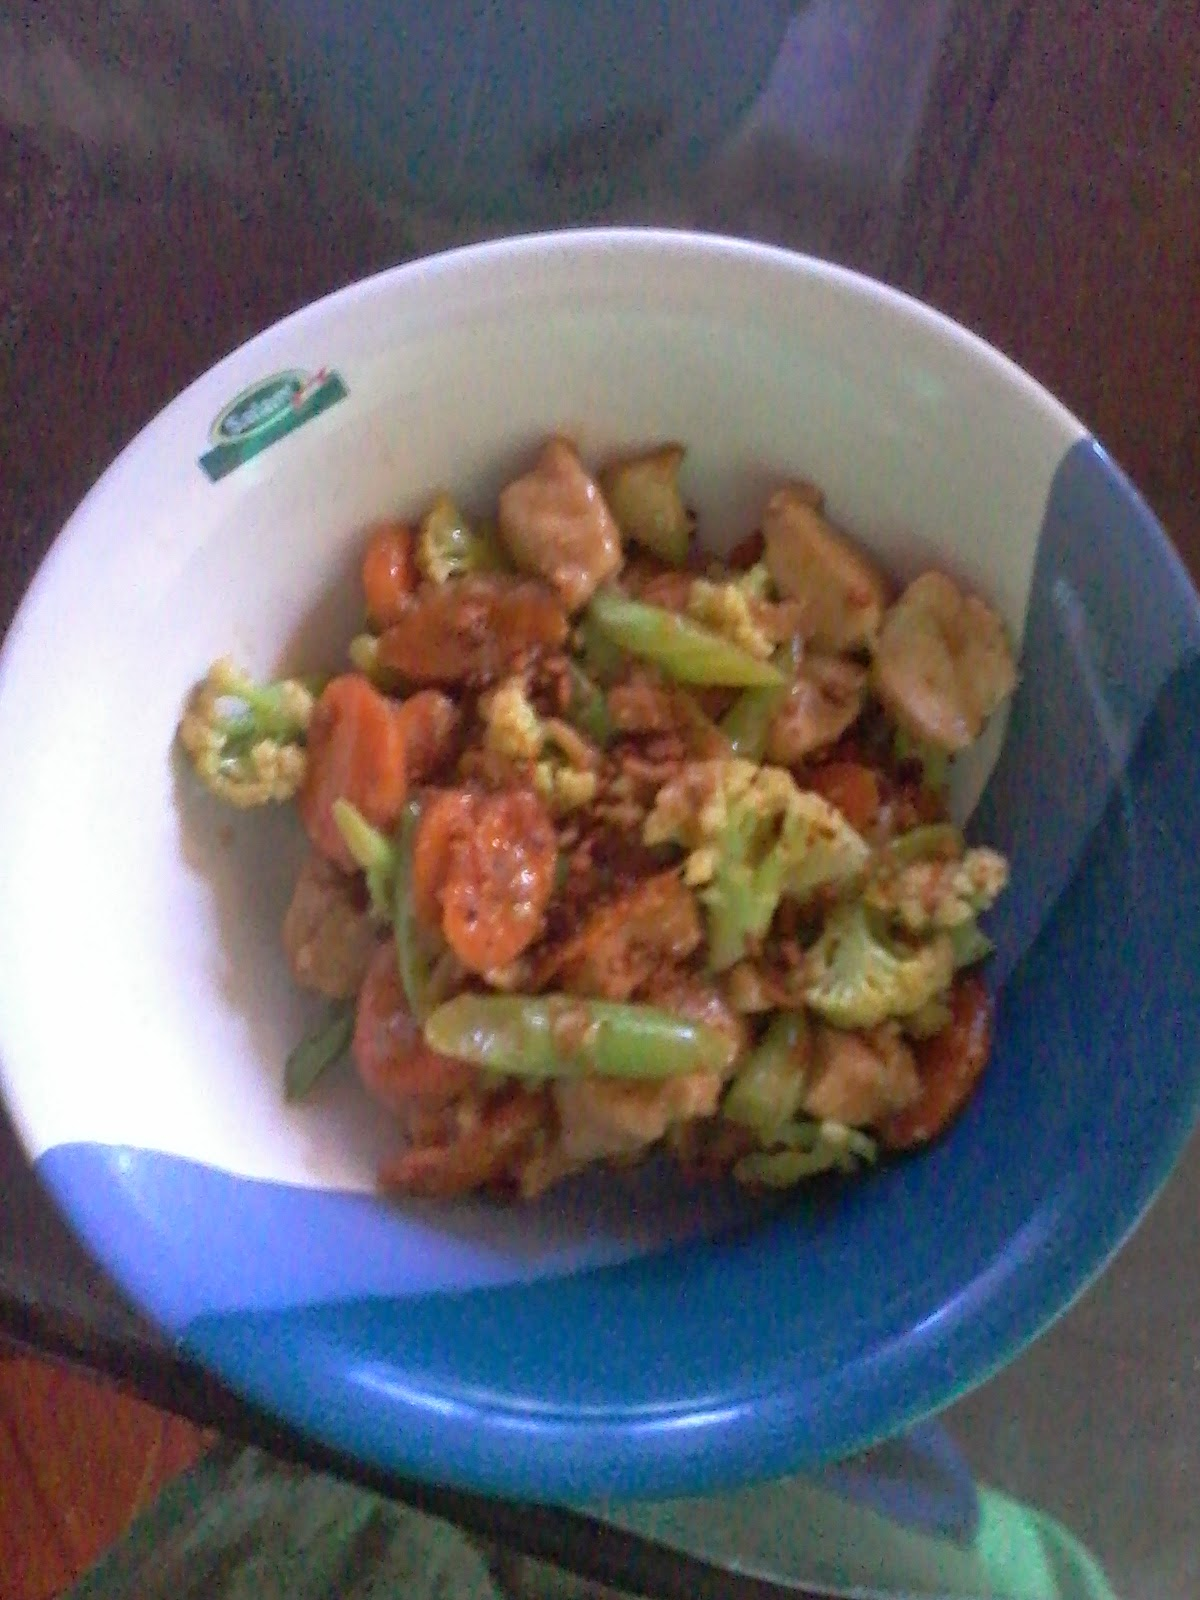 Tumis jahe & bawang putih hingga harum masukkan ayam sampai setengah matang Masukkan sedikit